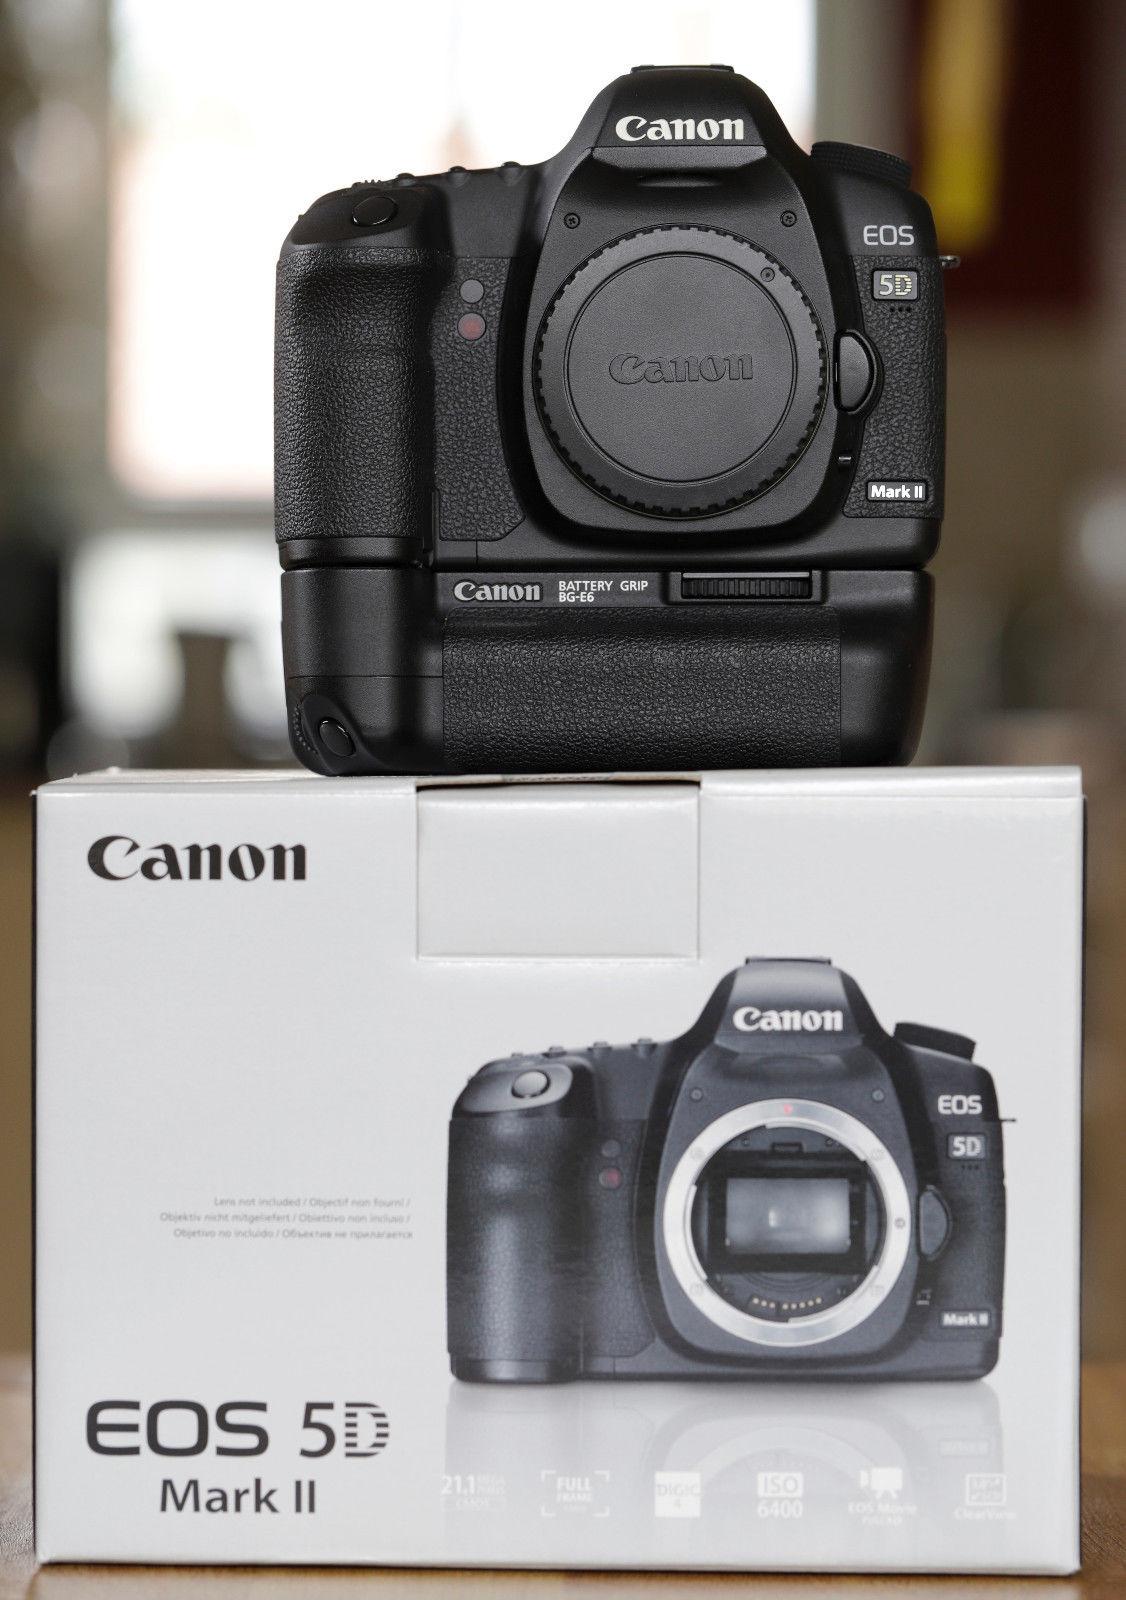 Canon EOS 5D Mark II, Top-Zustand nach Canon-Service, mit Batteriegriff, in OVP